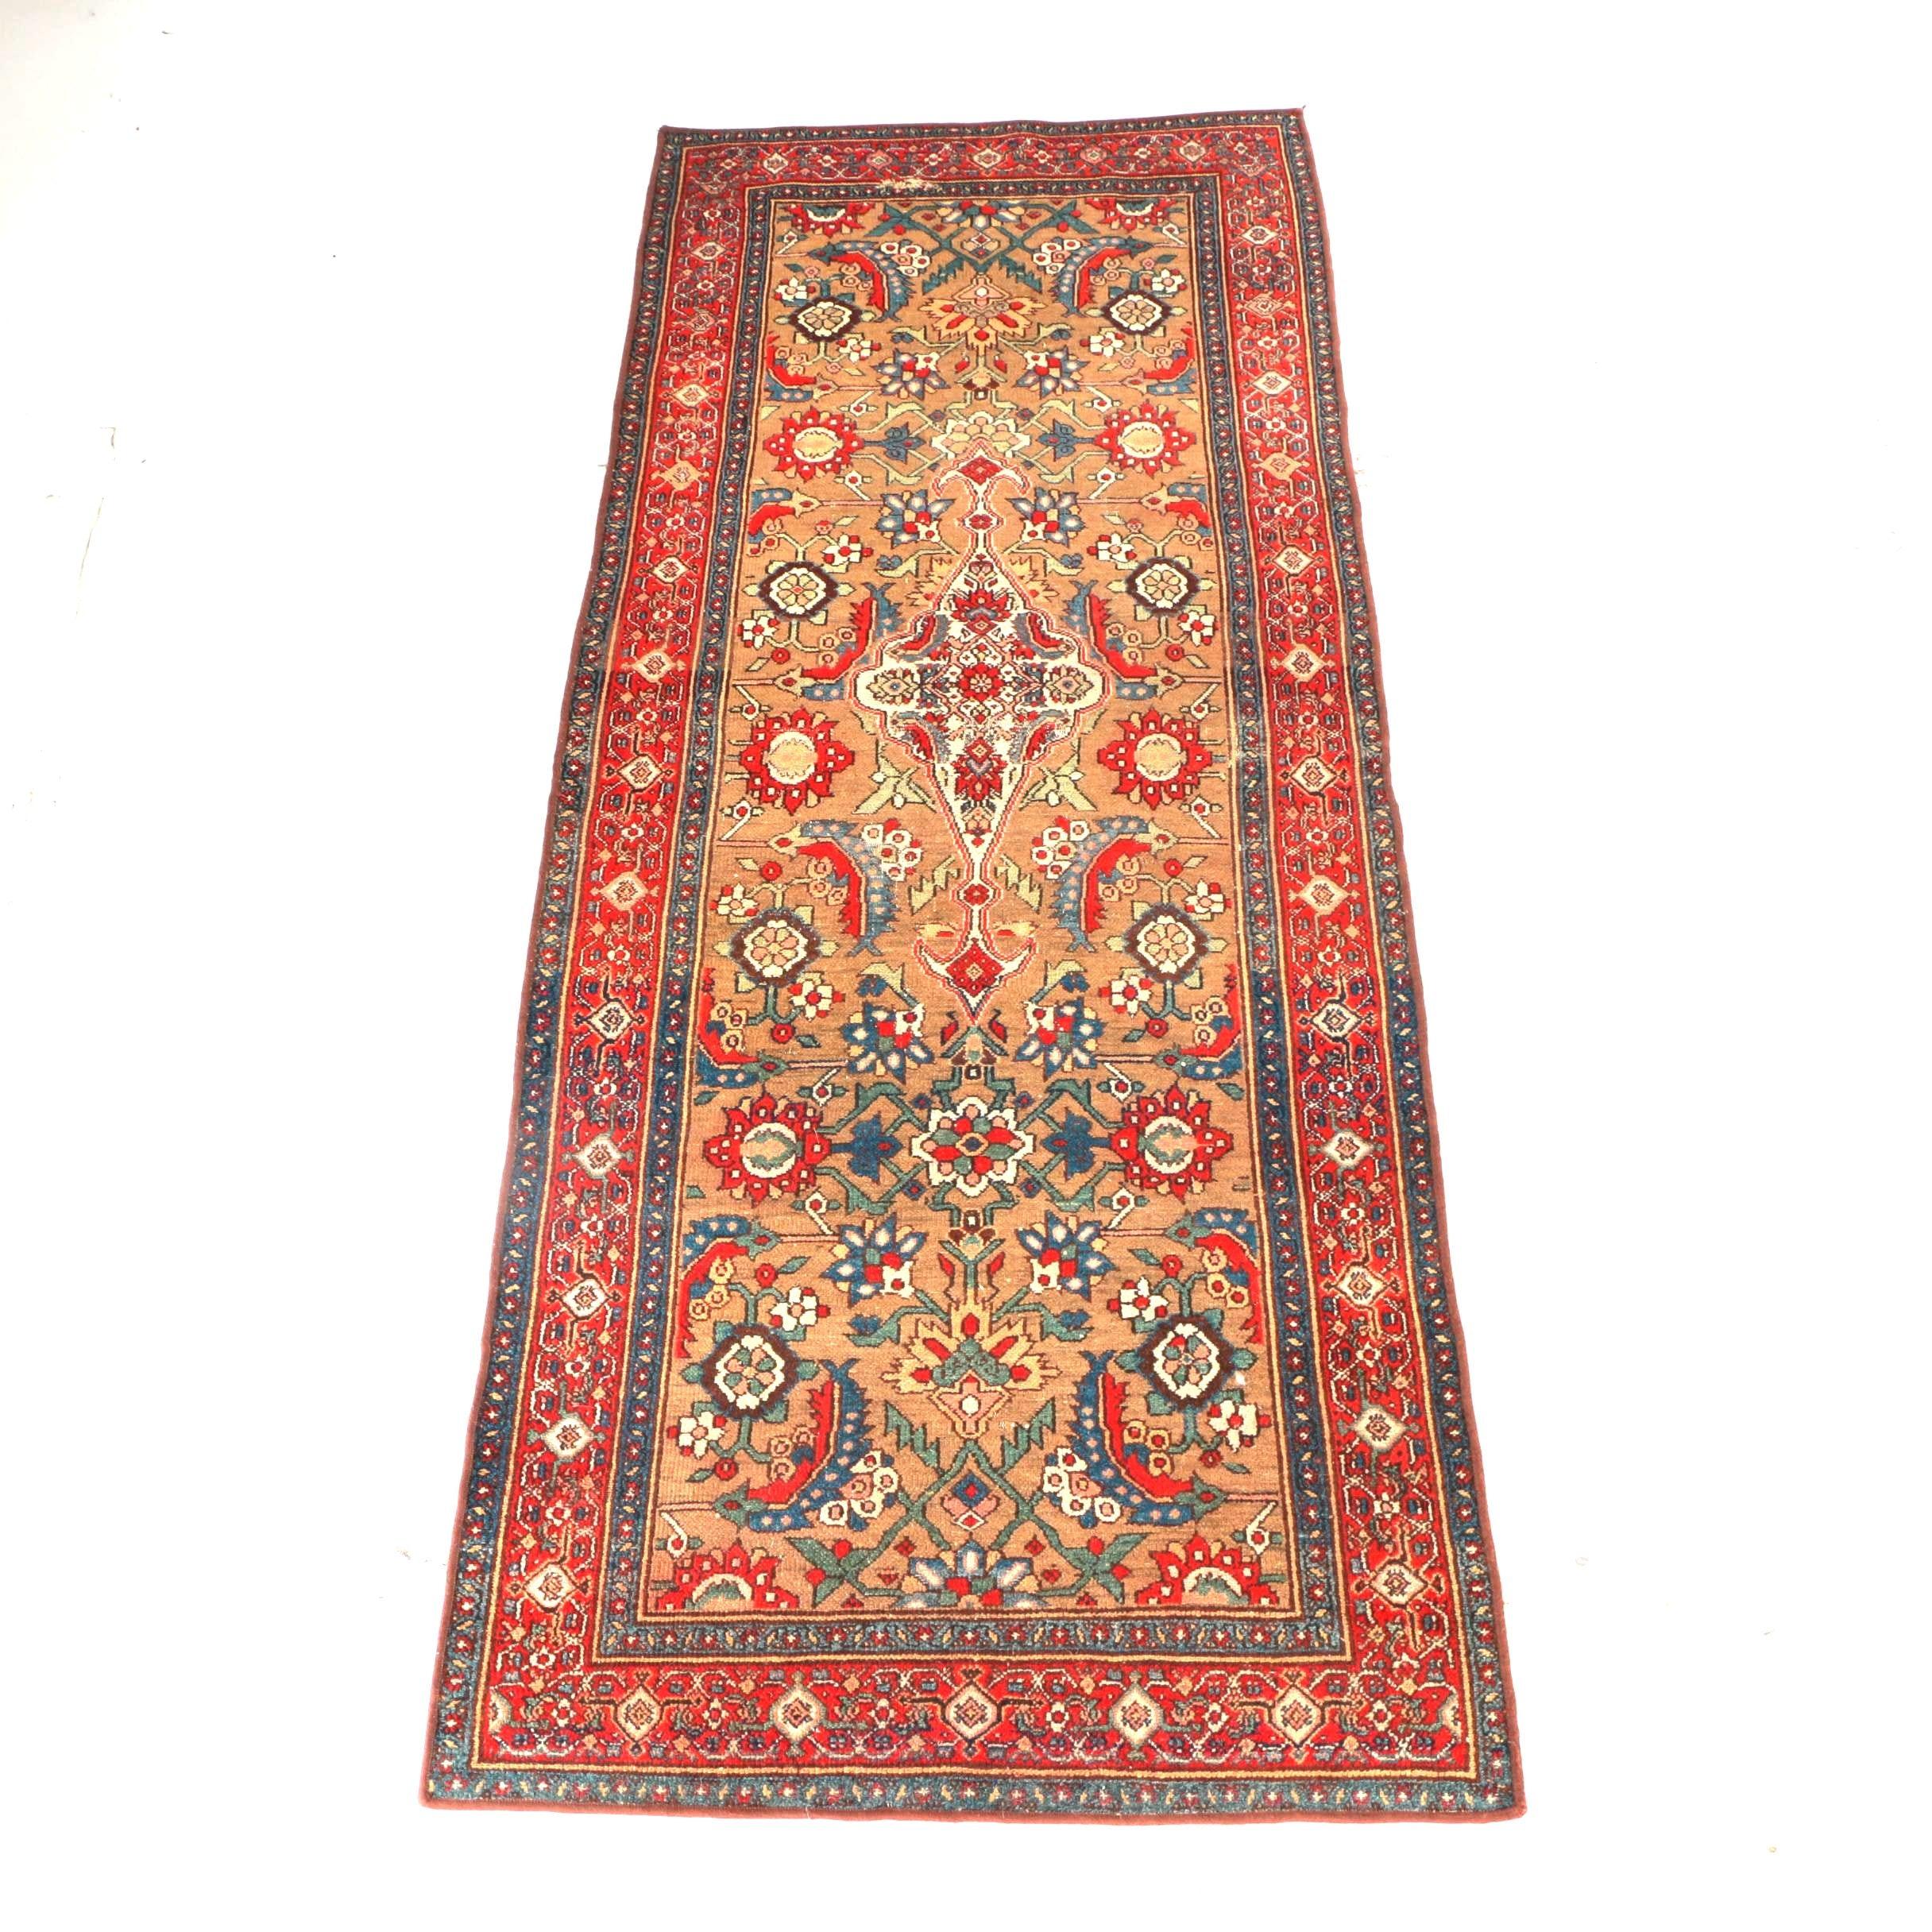 Antique Handwoven Persian Long Rug